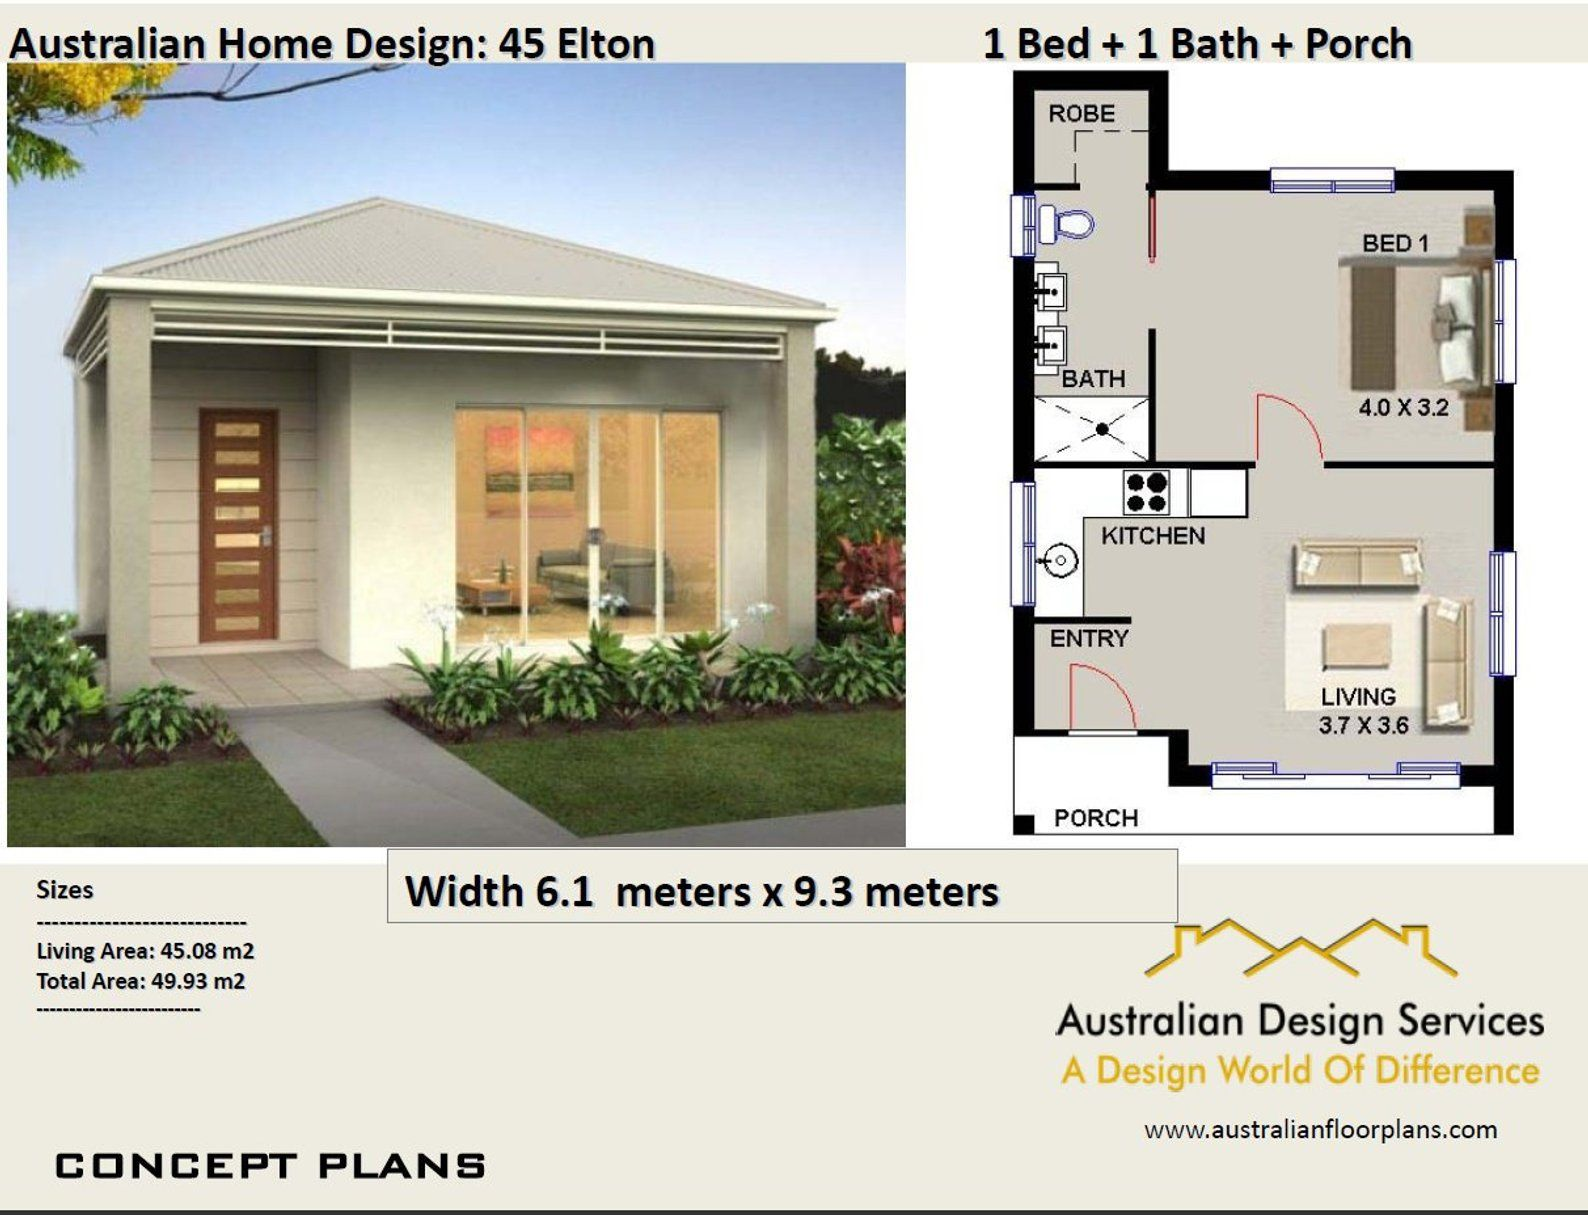 Small House Plan 45 Elton 537 Sq Foot 45 93 M2 1 Bedroom Etsy Tiny House Plans Small House Plans House Design